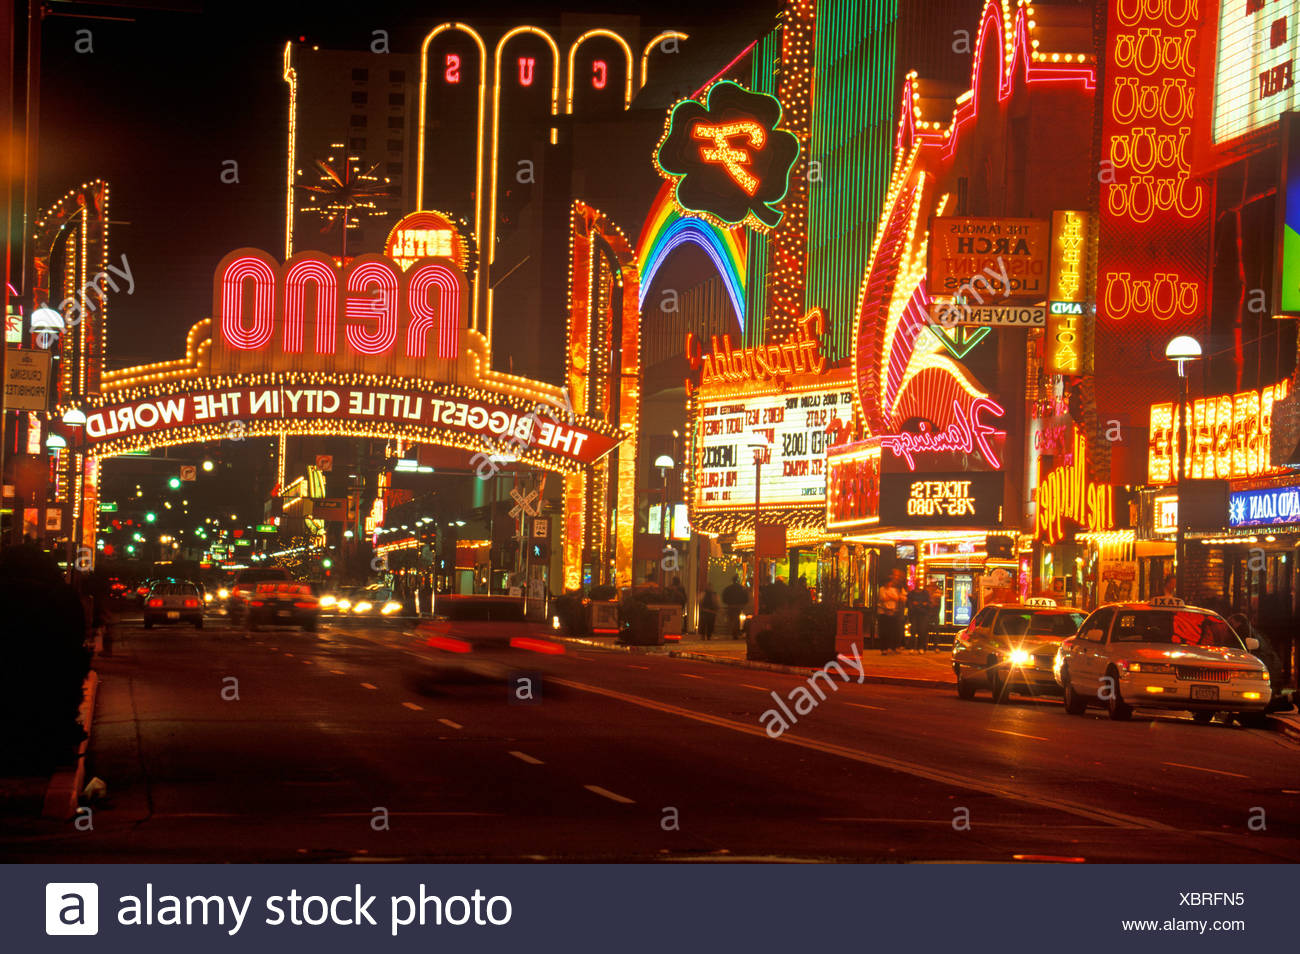 neon lights at night in reno nv stock photo 282644353 alamy